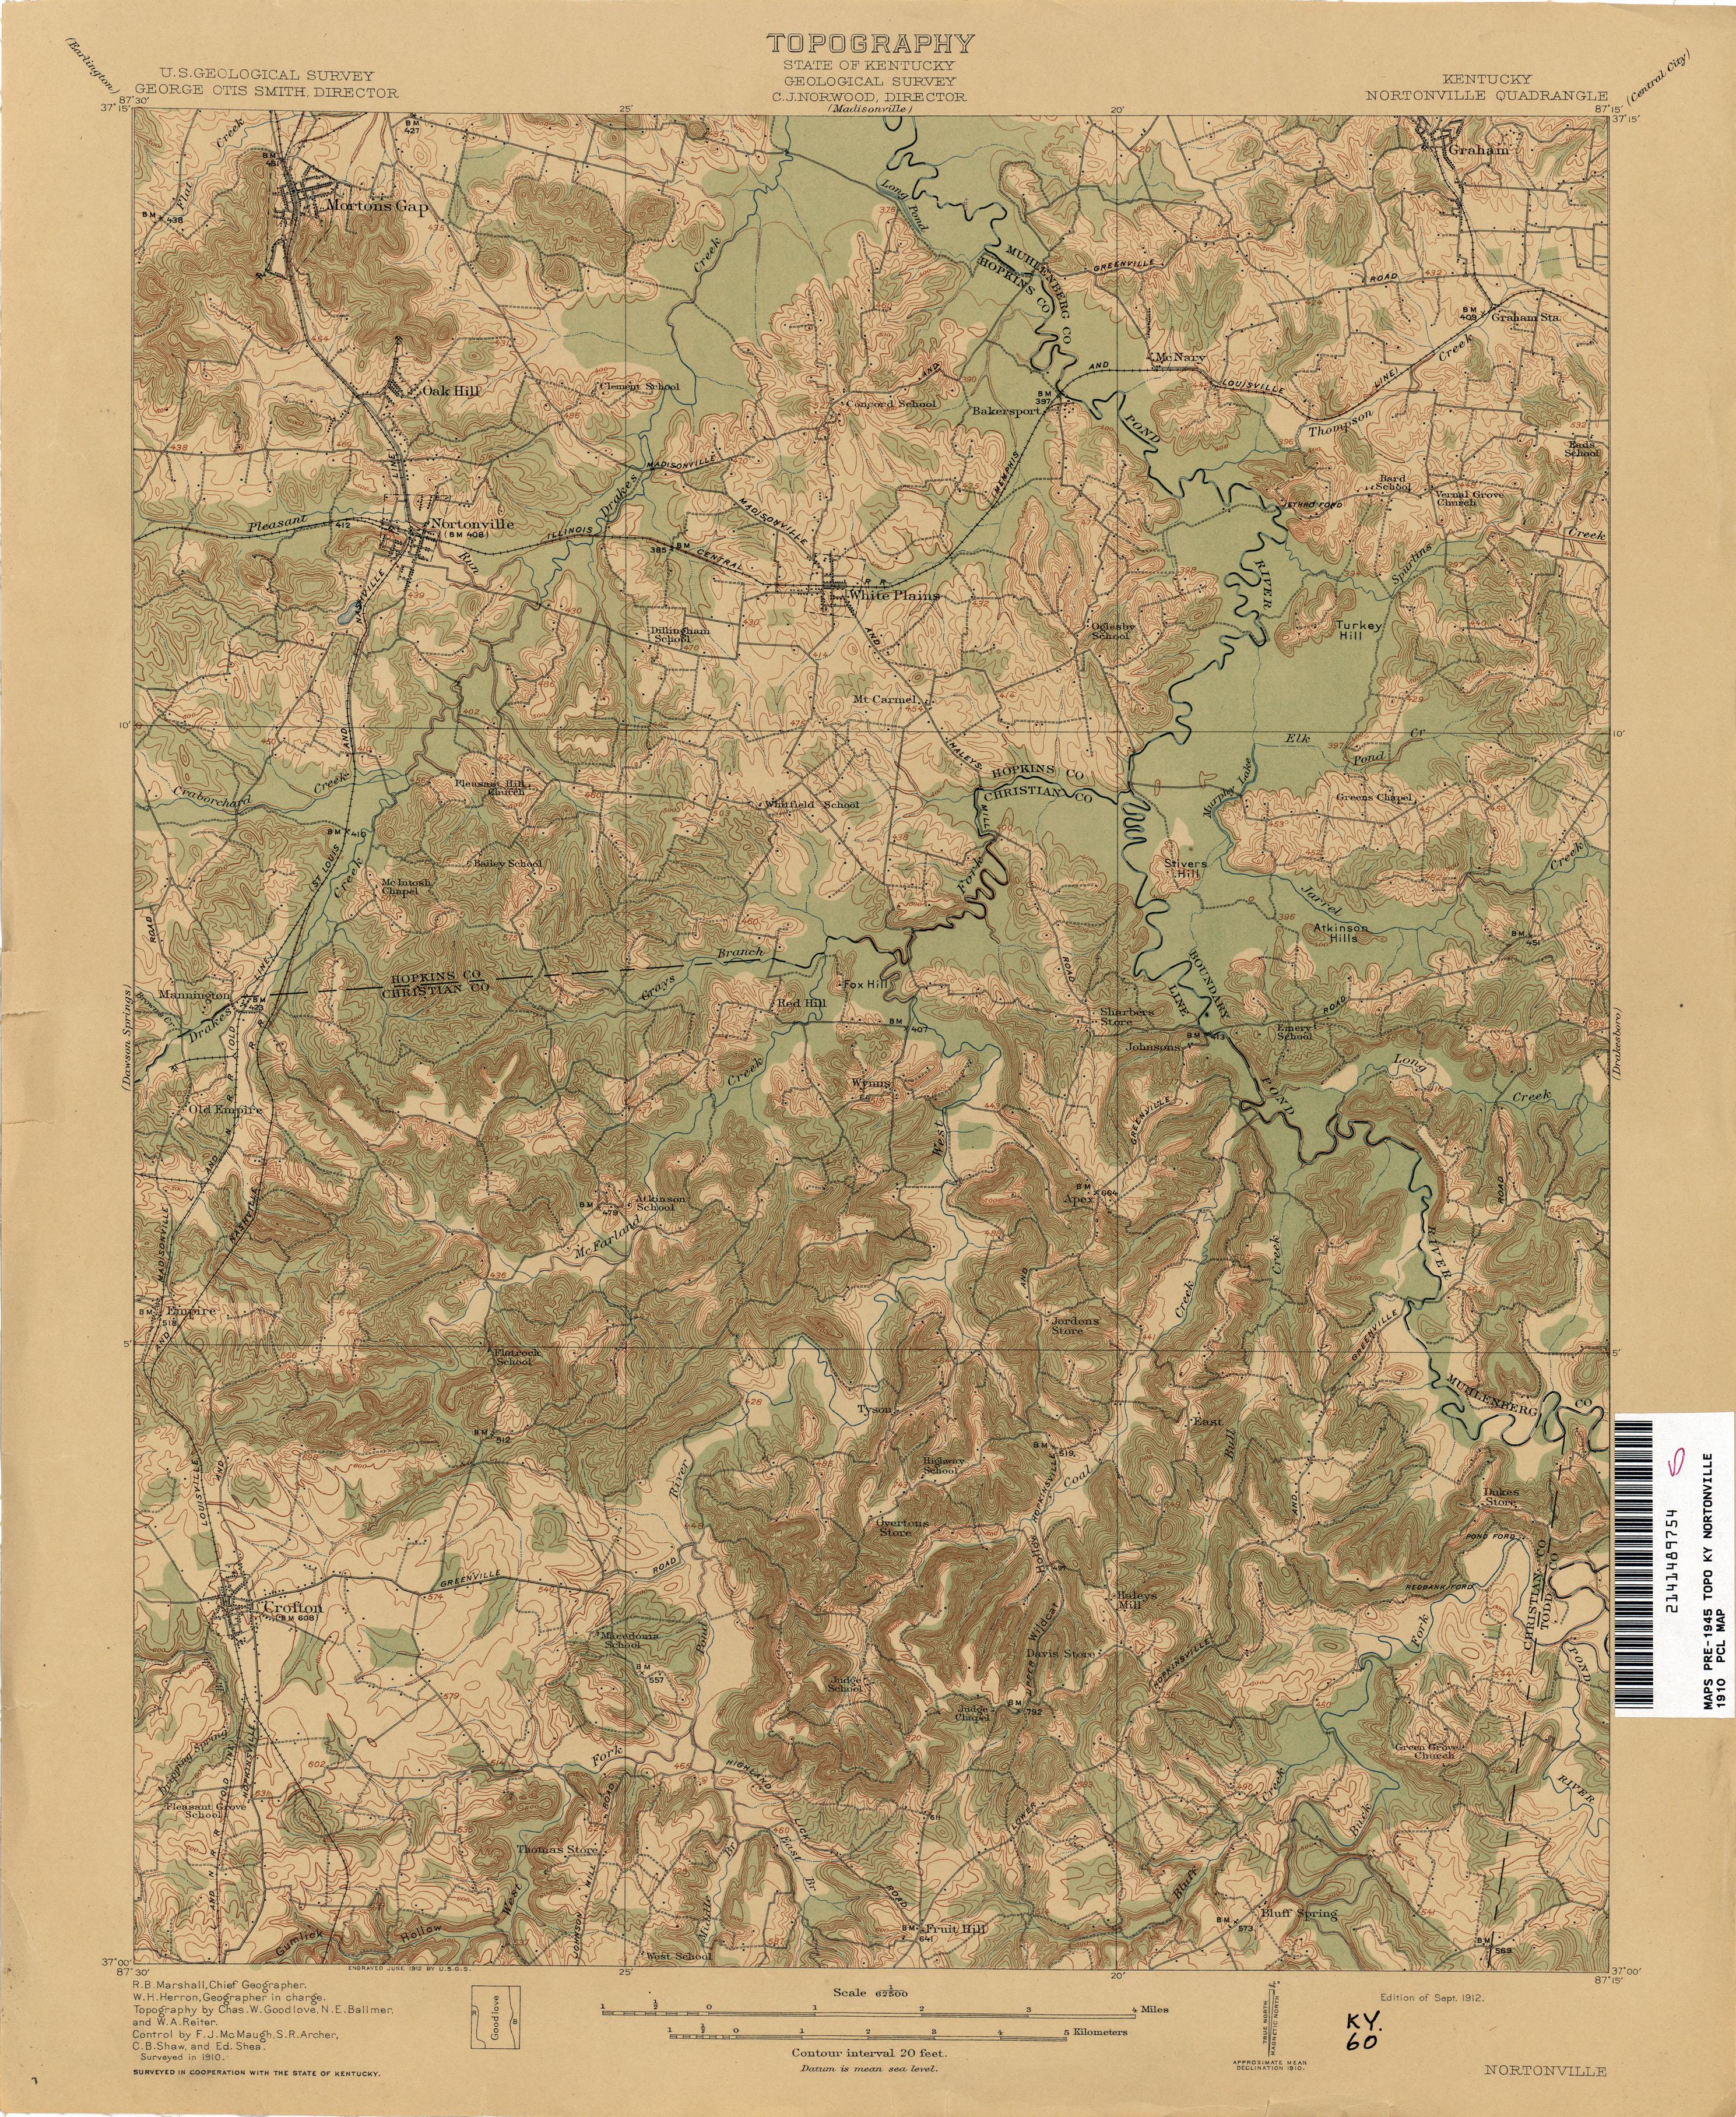 Kentucky Historical Topographic Maps - Perry-Castañeda Map ... on tn gis civil war, the battle of malvern hill civil war, seven days campaign civil war, bowling green civil war,